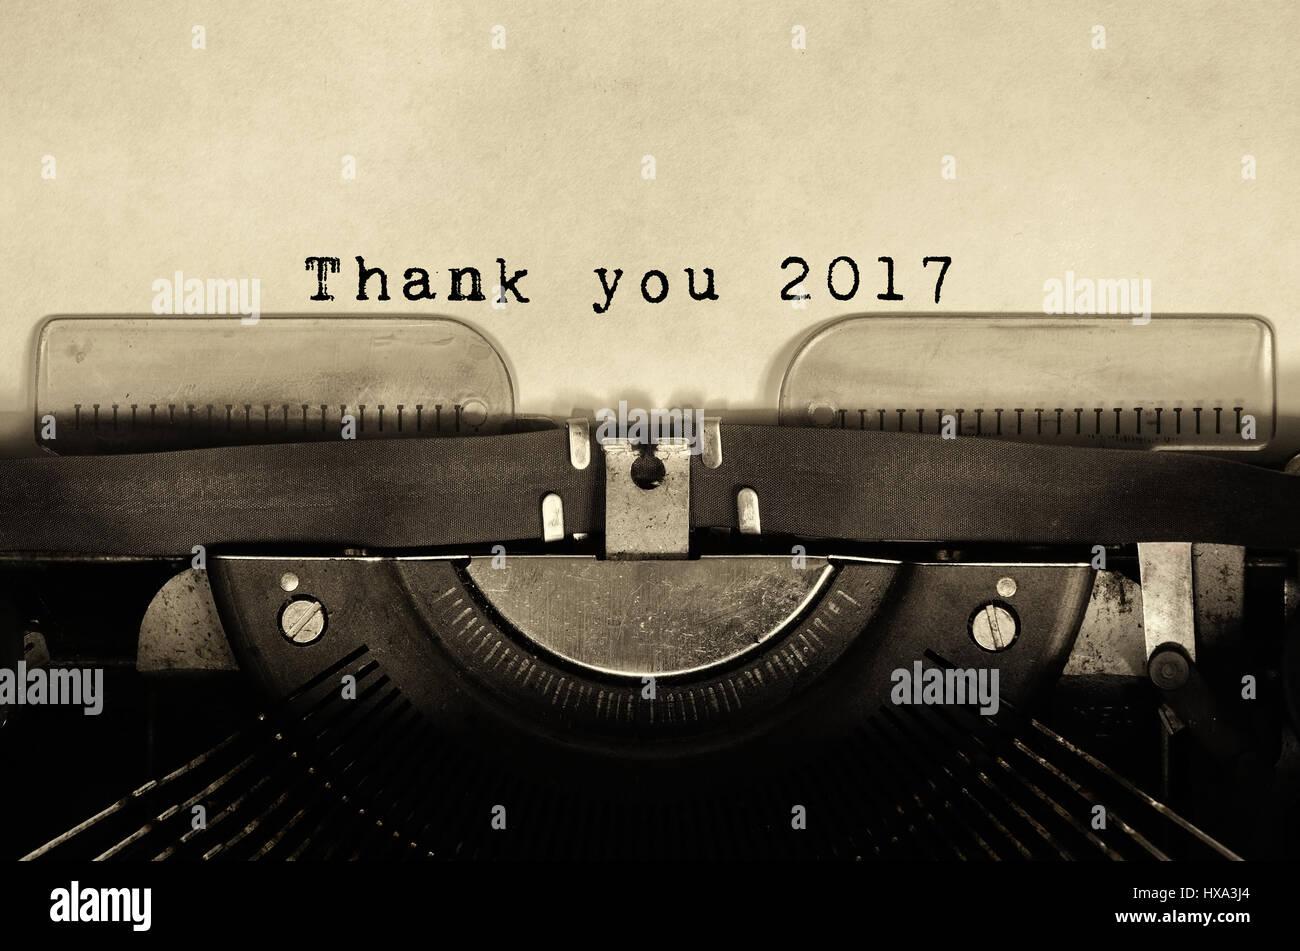 Thank you 2017 words typed on vintage typewriter. - Stock Image